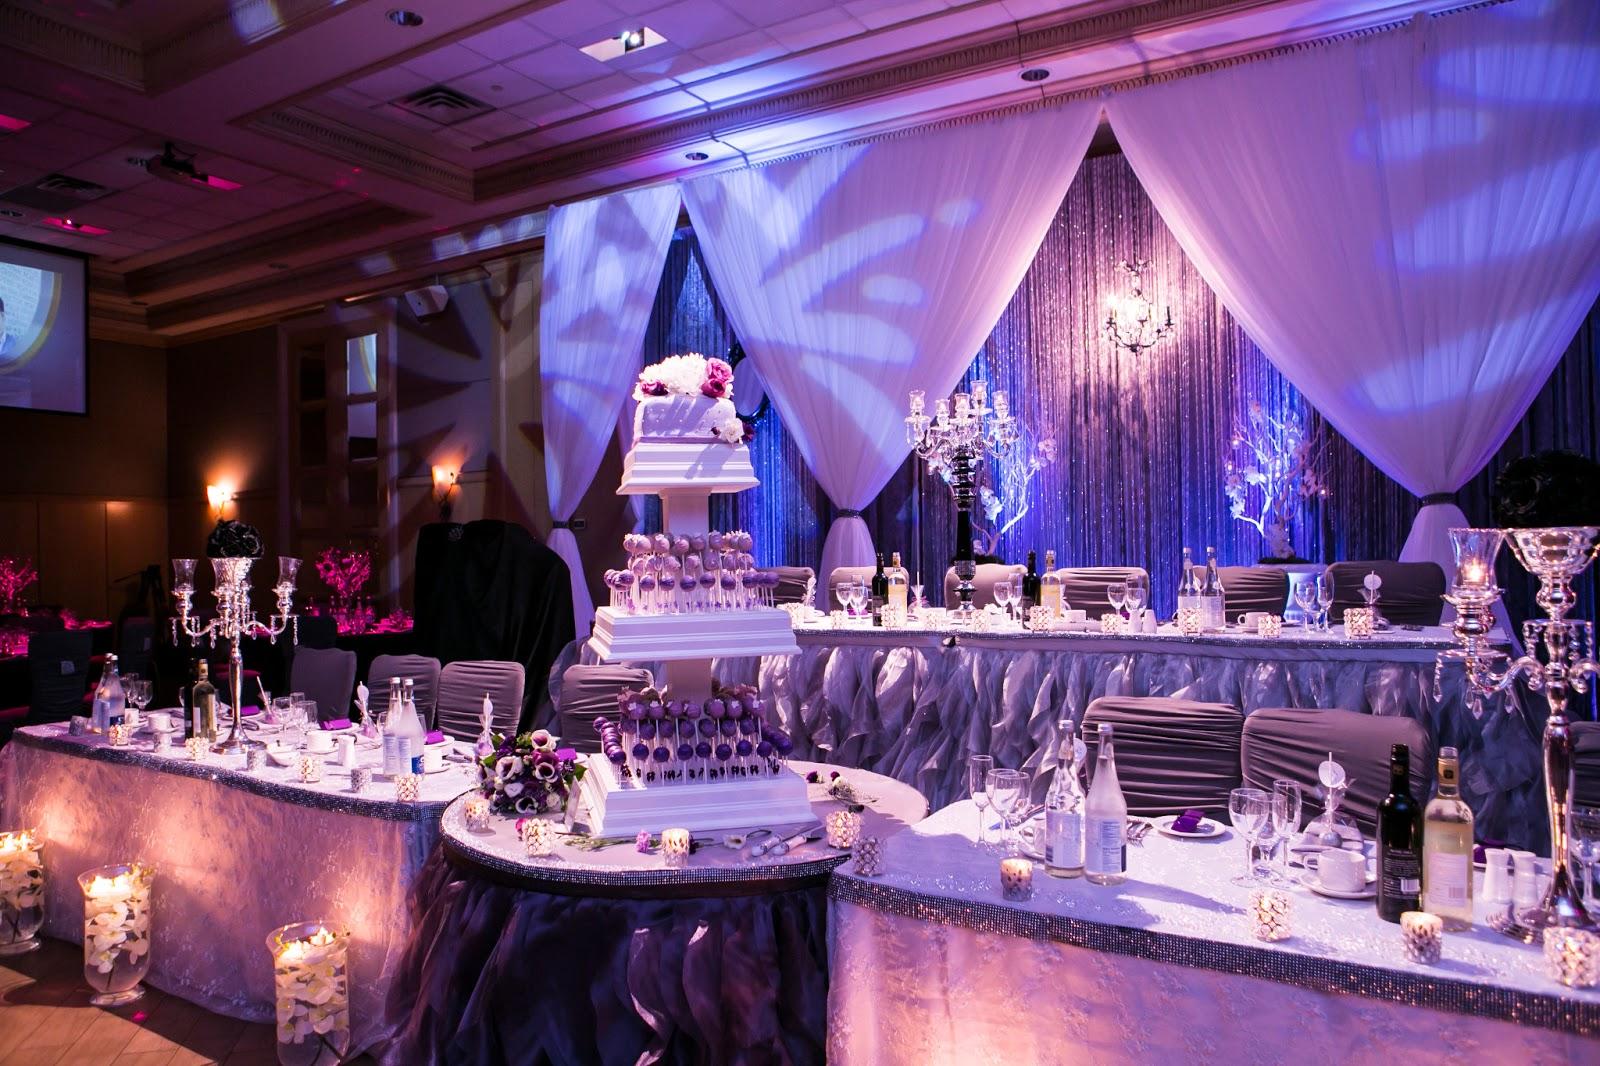 chair covers vaughan blue leather trade sensation: karen & ed- june 8th, 2013- bellagio banquet hall, vaughan- full coordination ...